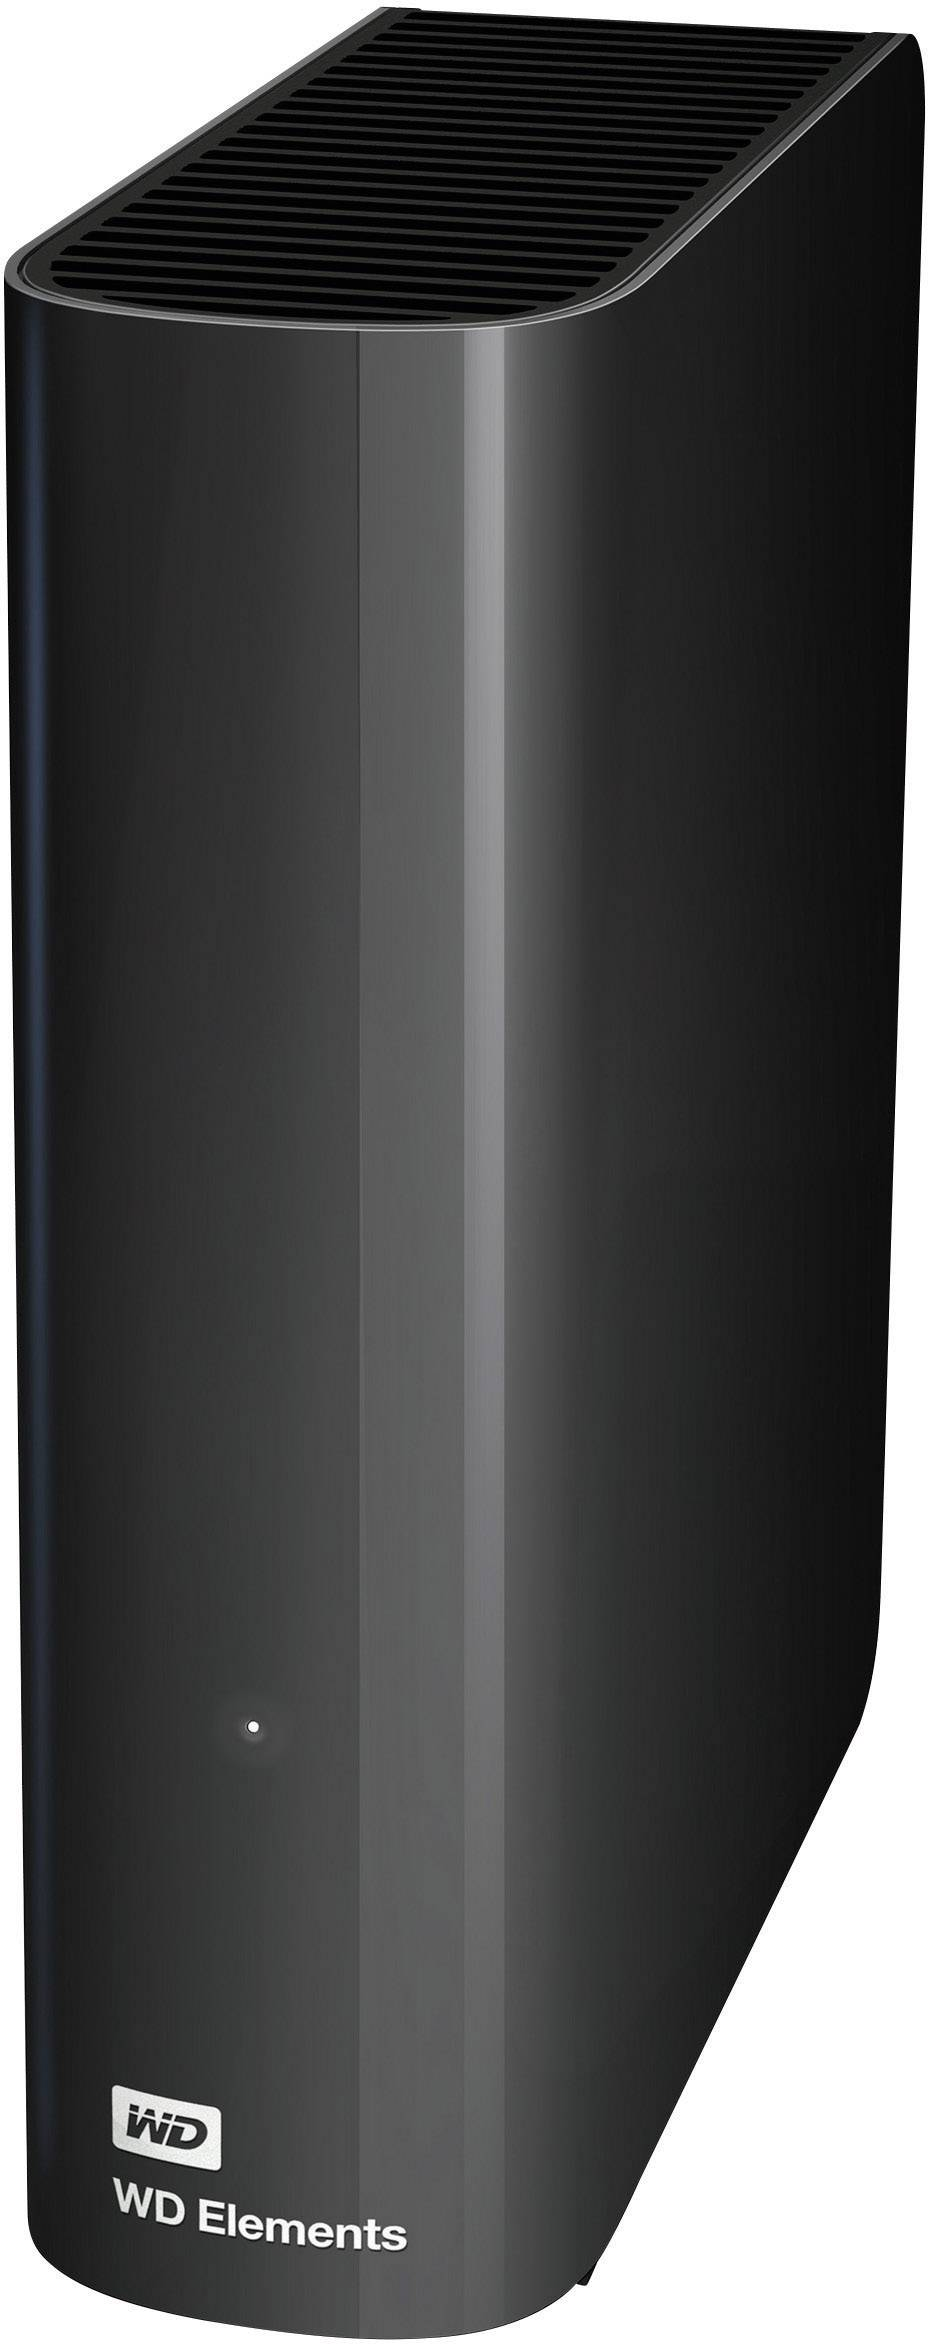 "Externí HDD 8,9 cm (3,5"") Western Digital Elements™, 3 TB, USB 3.0, černá"